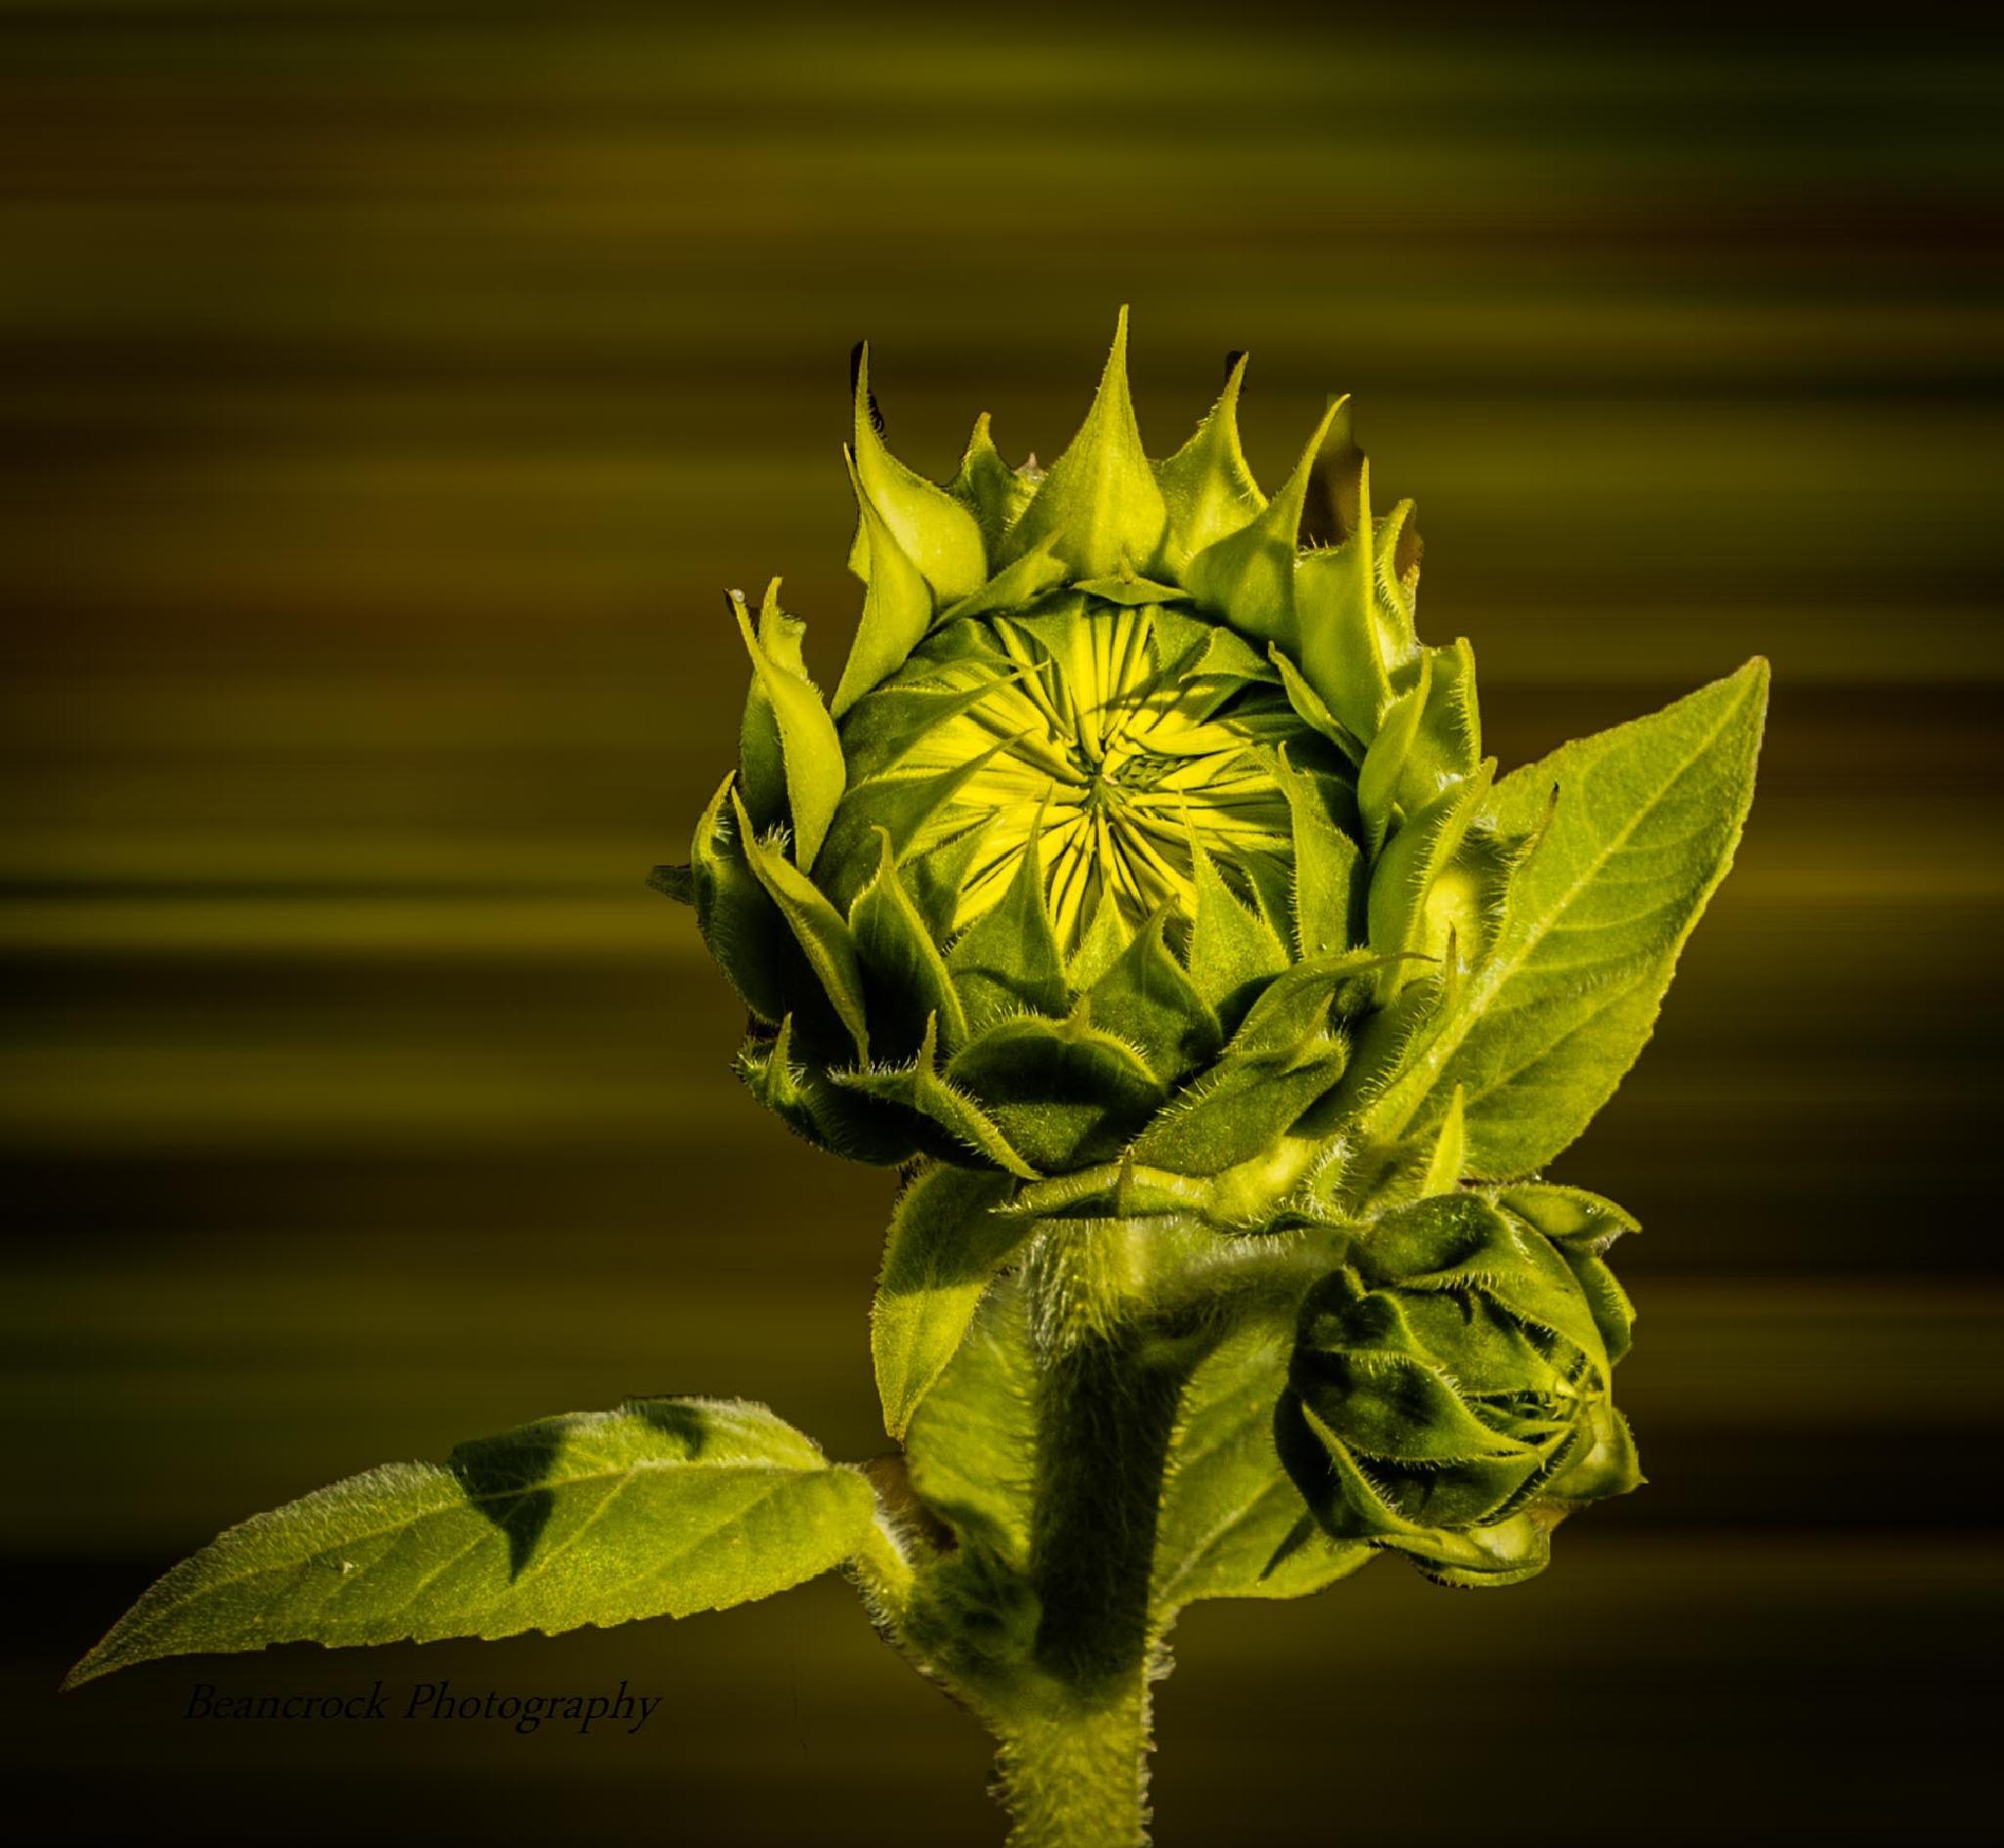 Sunflower by Alan Pryor